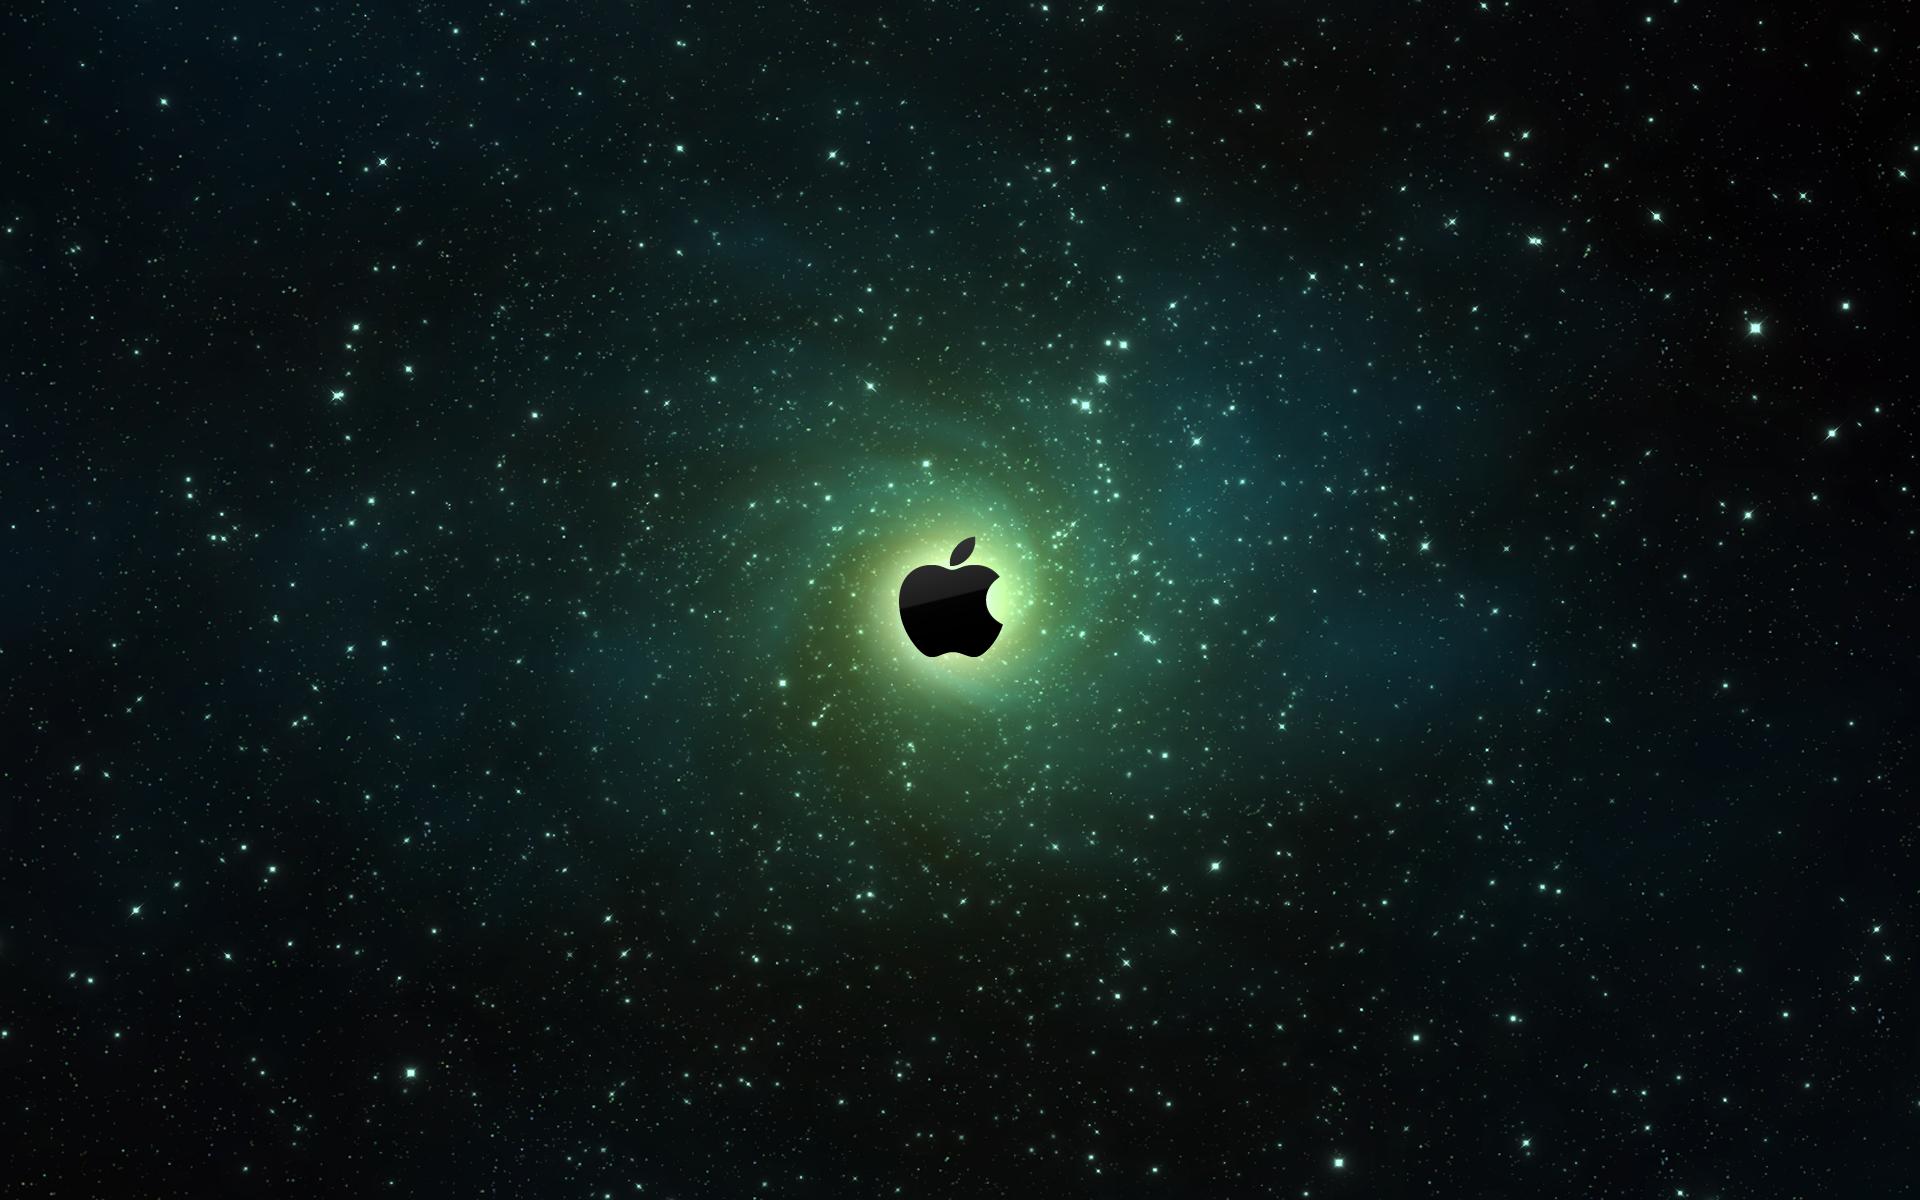 Apple wallpaper - 71650